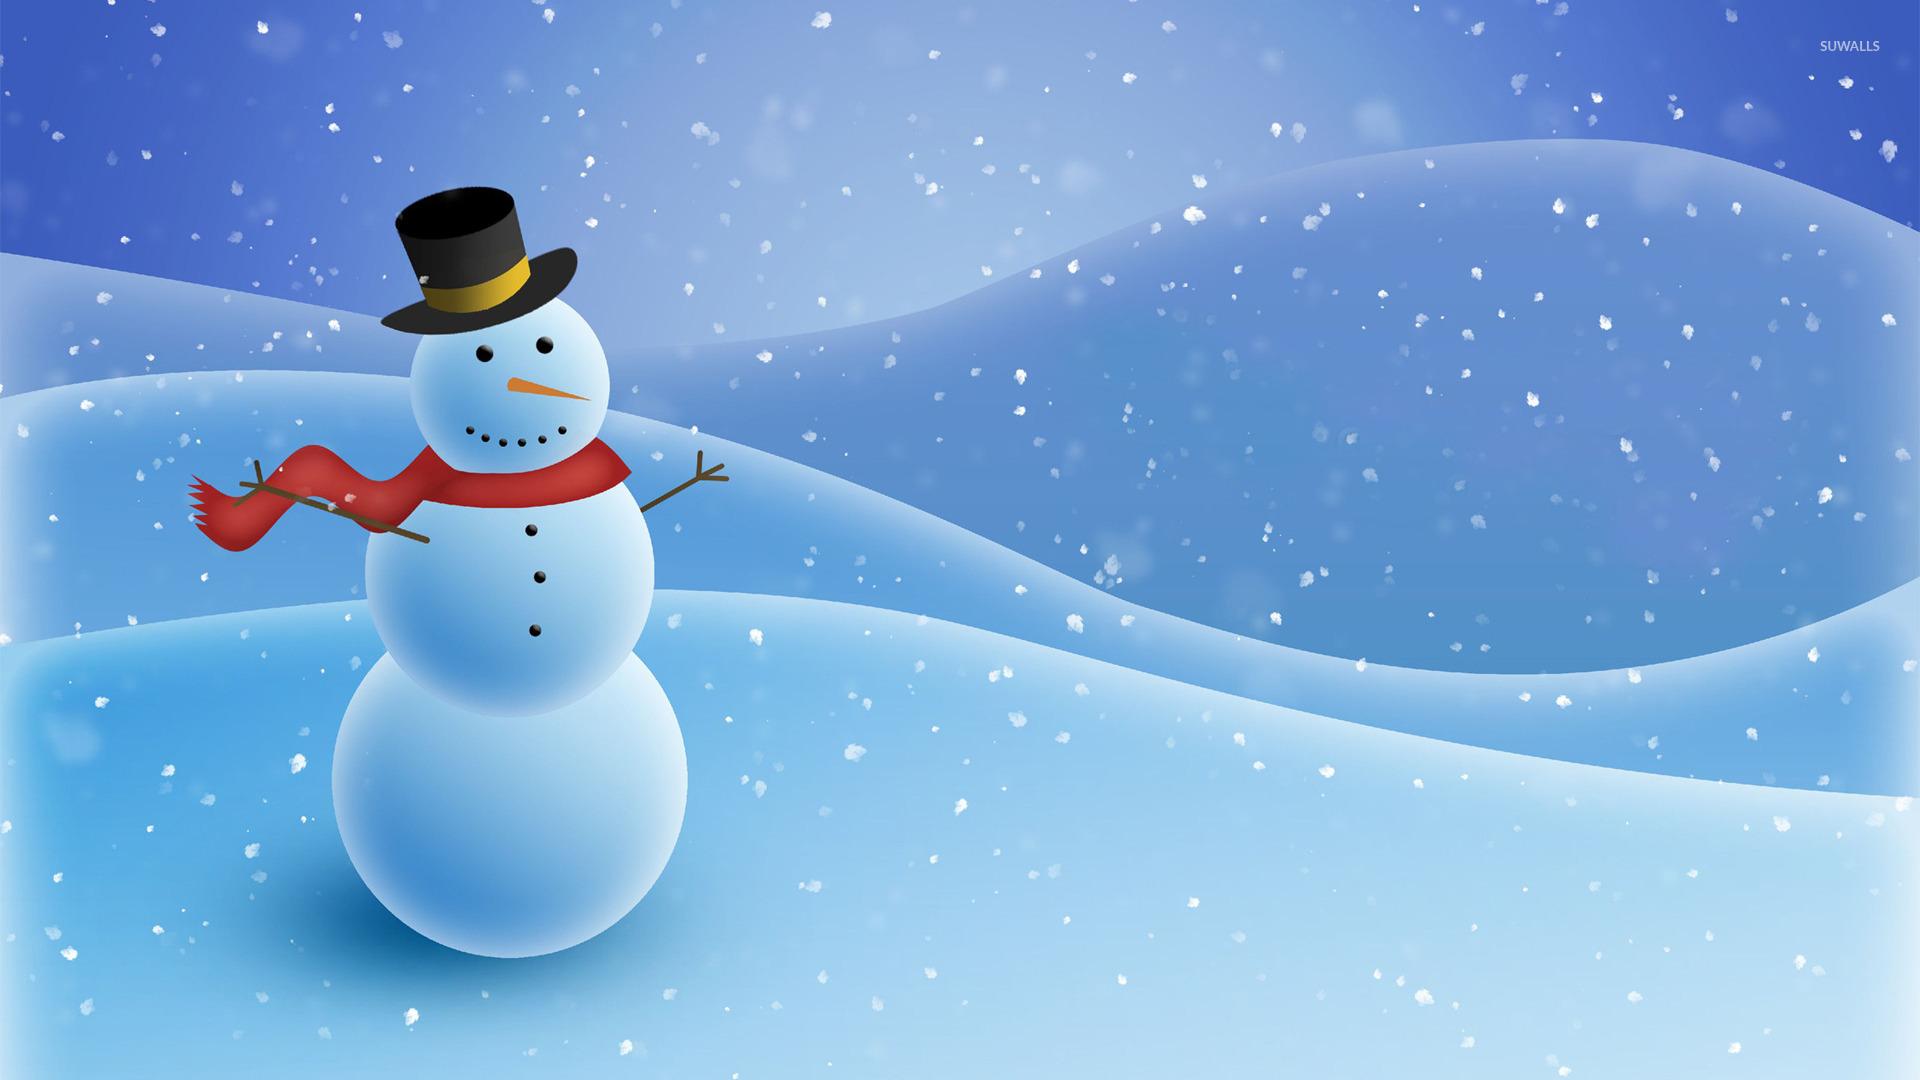 snowman 3 wallpaper holiday wallpapers 23584